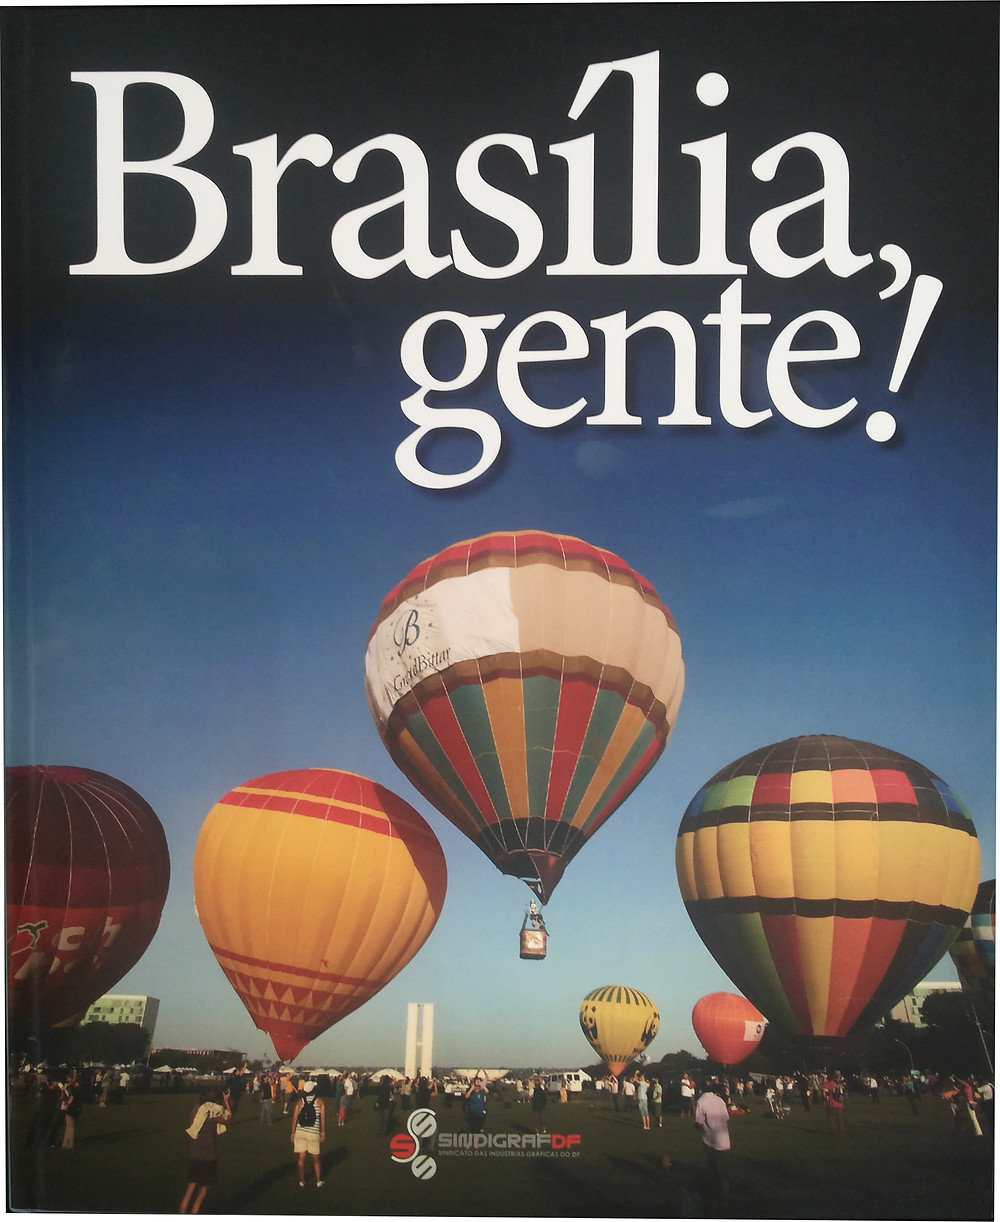 Foto de capa: Eraldo Peres